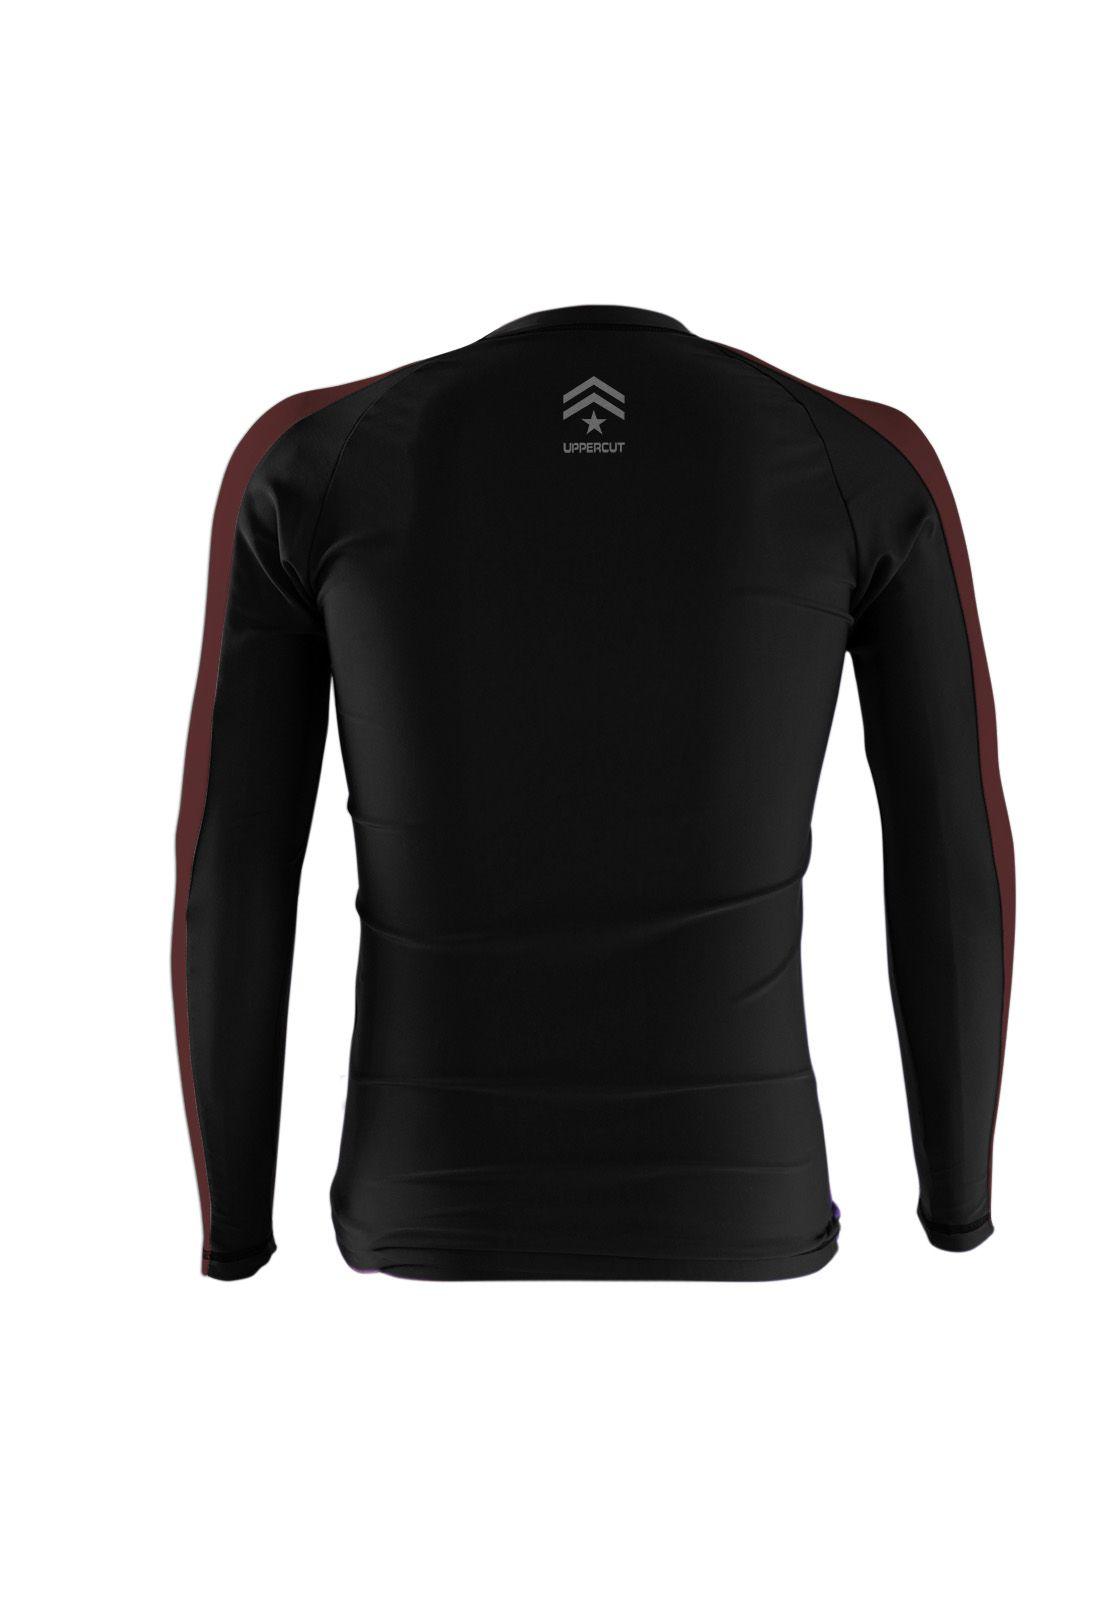 Camisa Rash Guard Justiceiro War R-4 - Preto/Marron - Uppercut  - Loja do Competidor